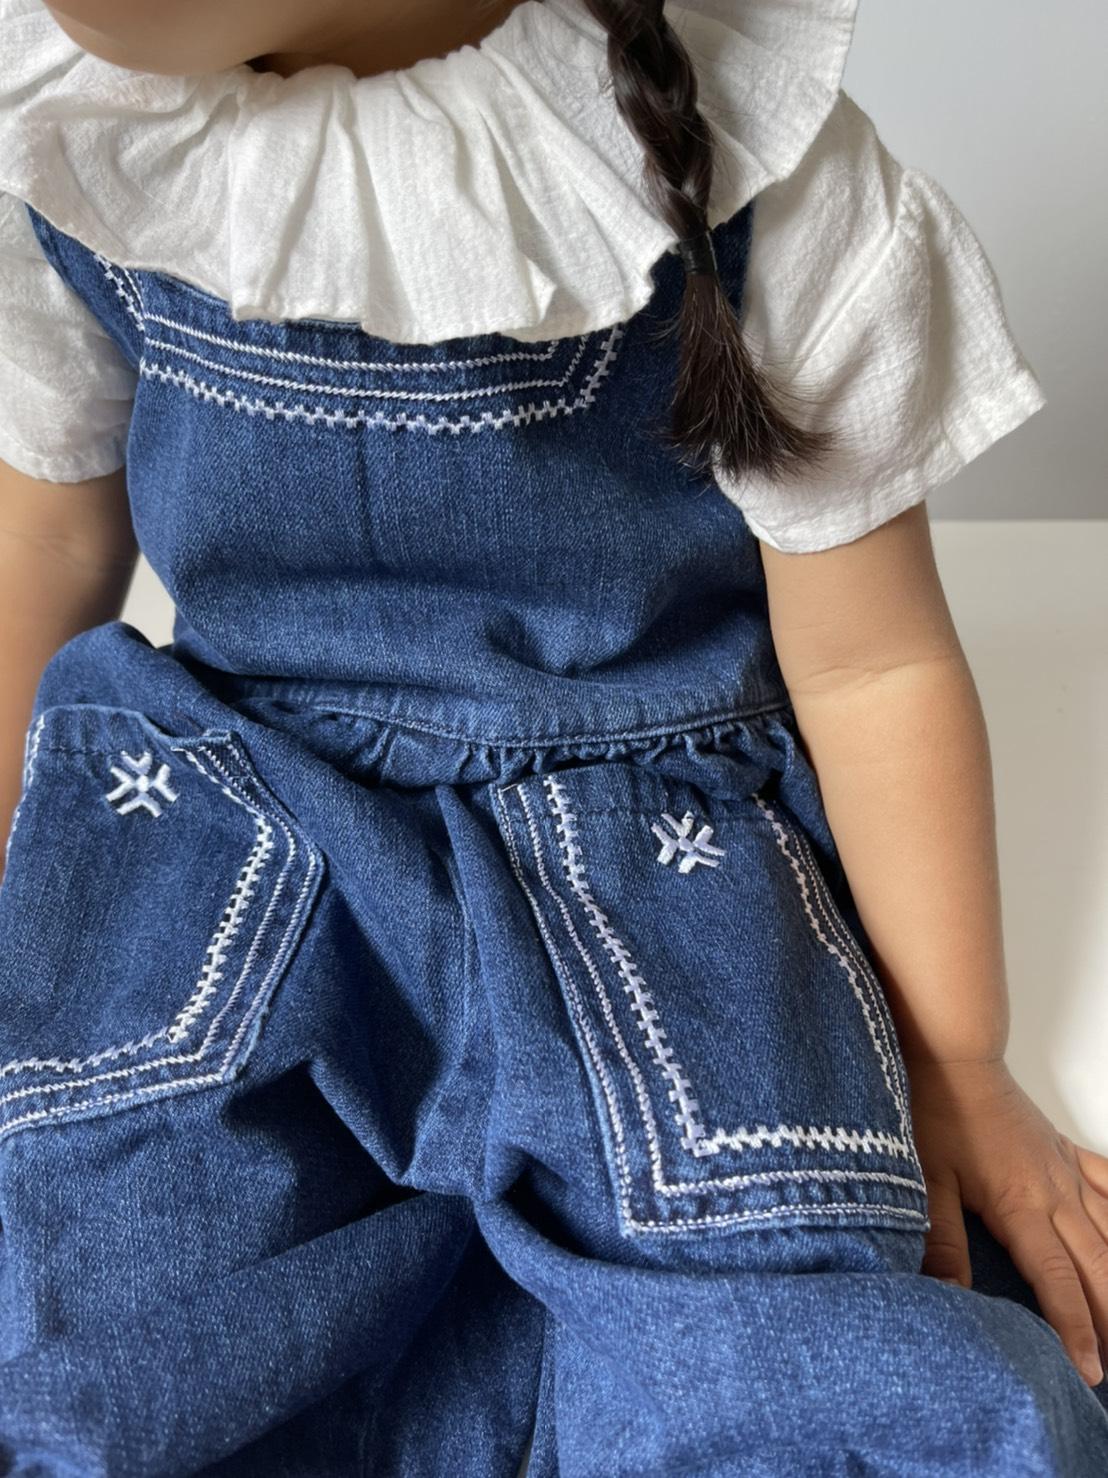 aile - Embroidery Denim salopette 90-130cm [5/5まで5%OFF]